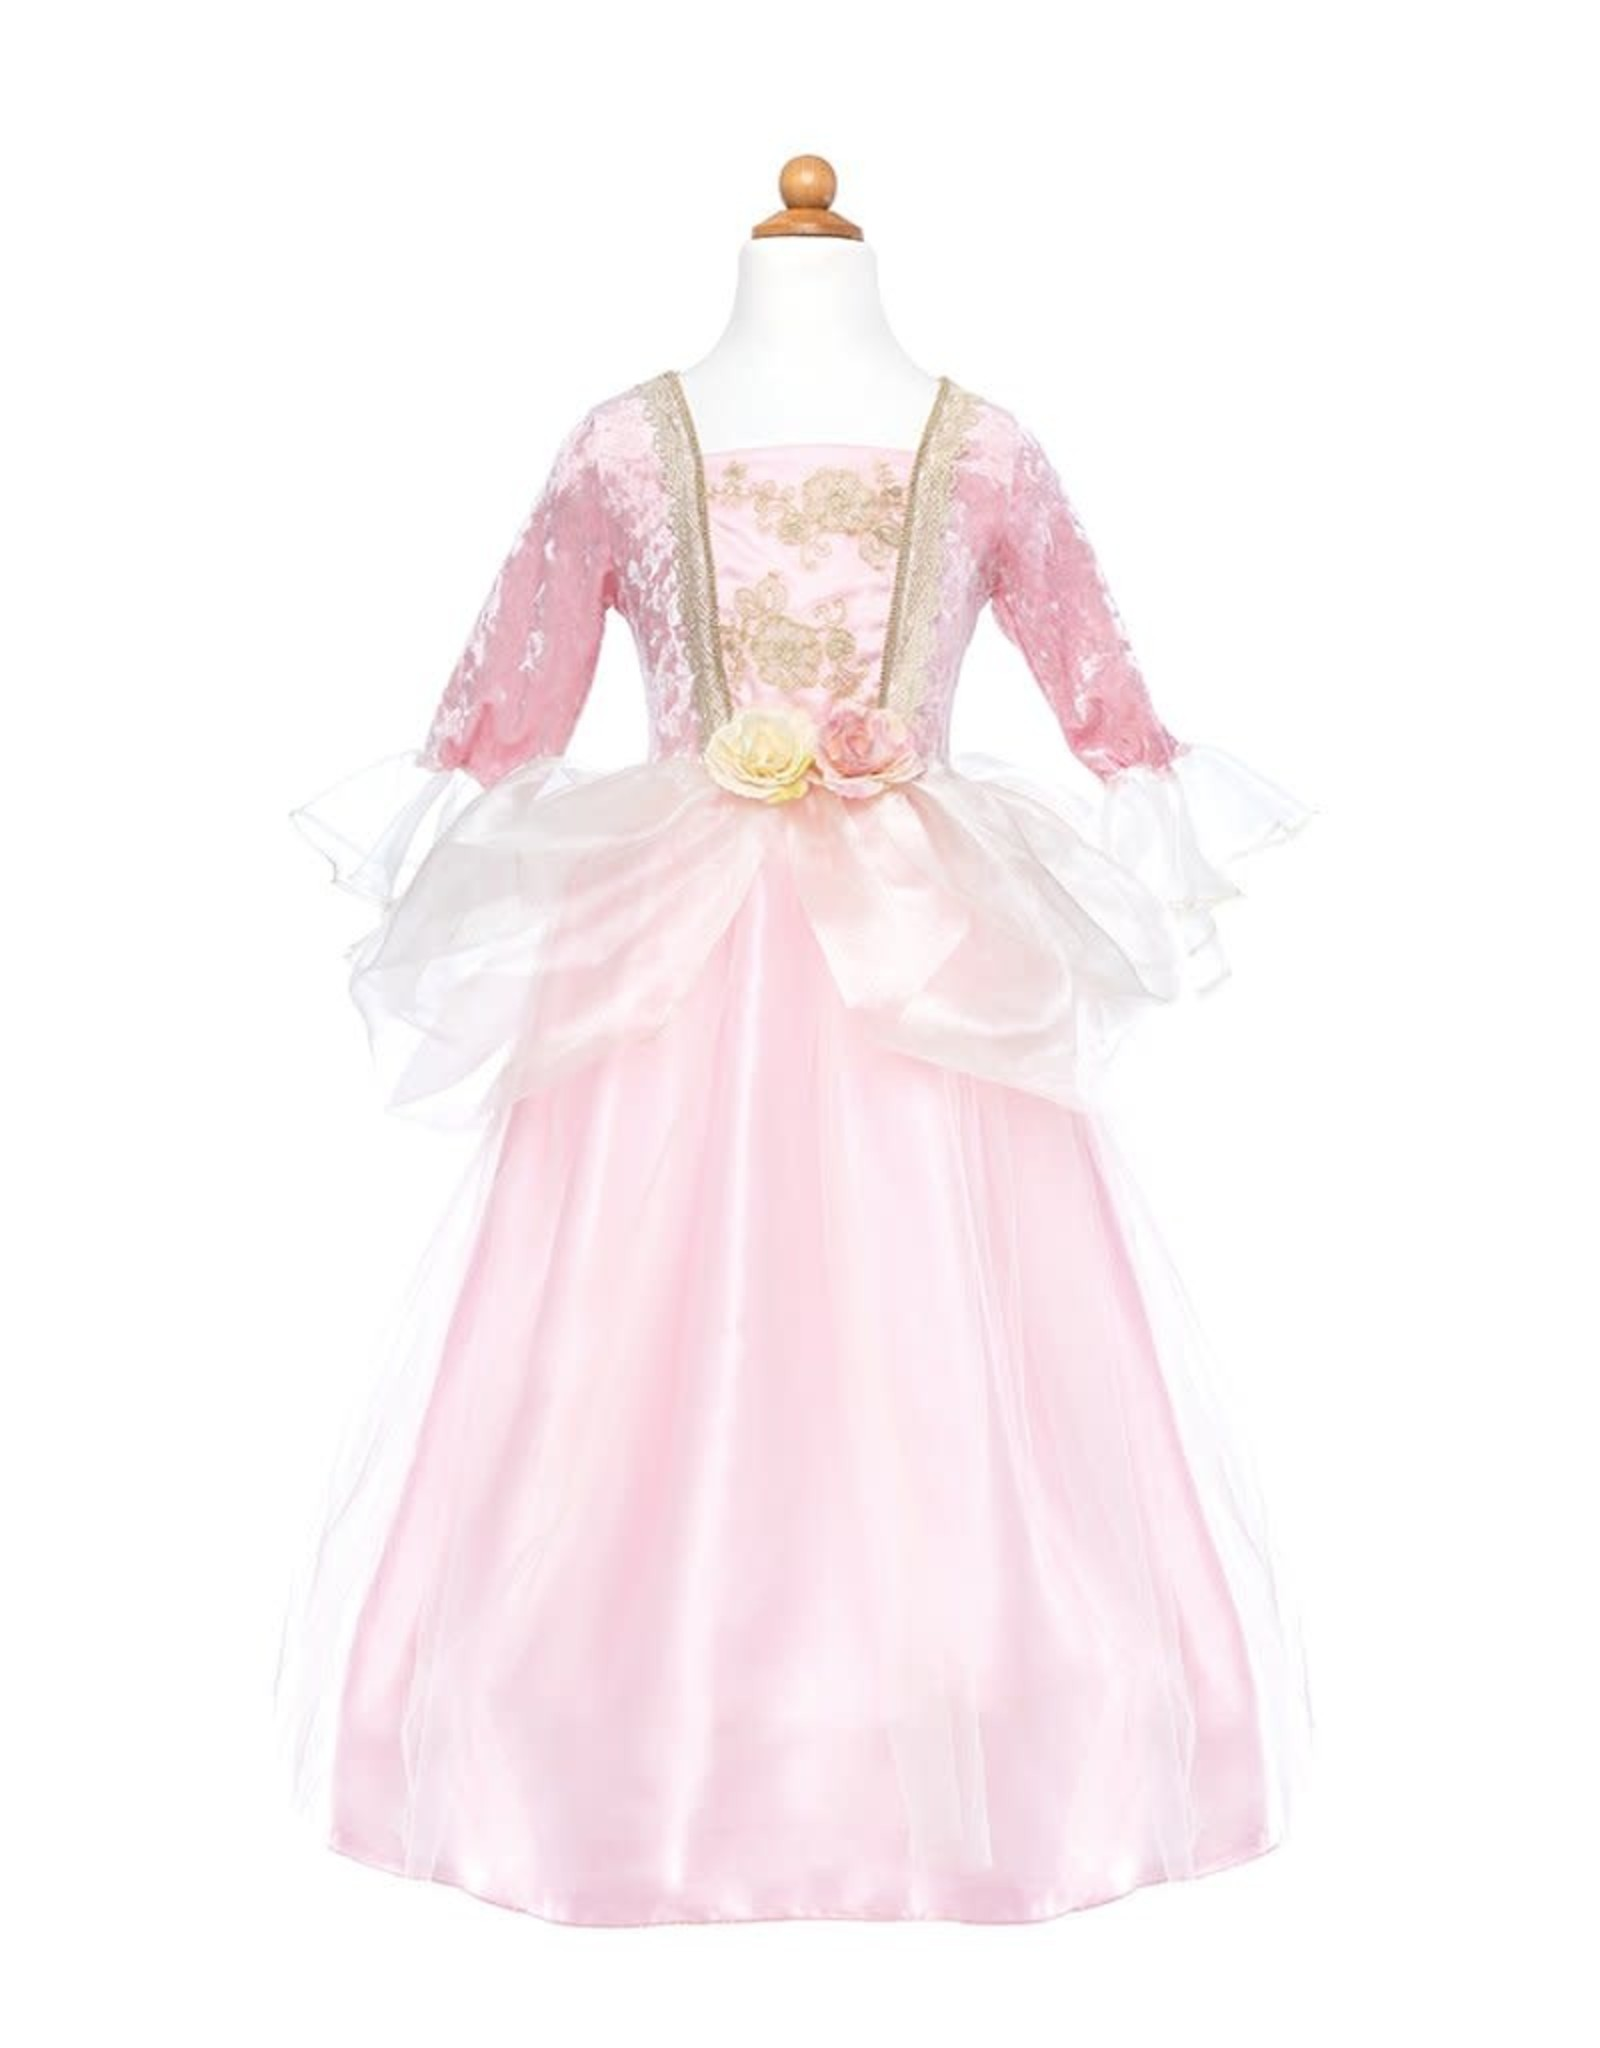 Great Pretenders Pink Rose Princess Dress, Size 3-4